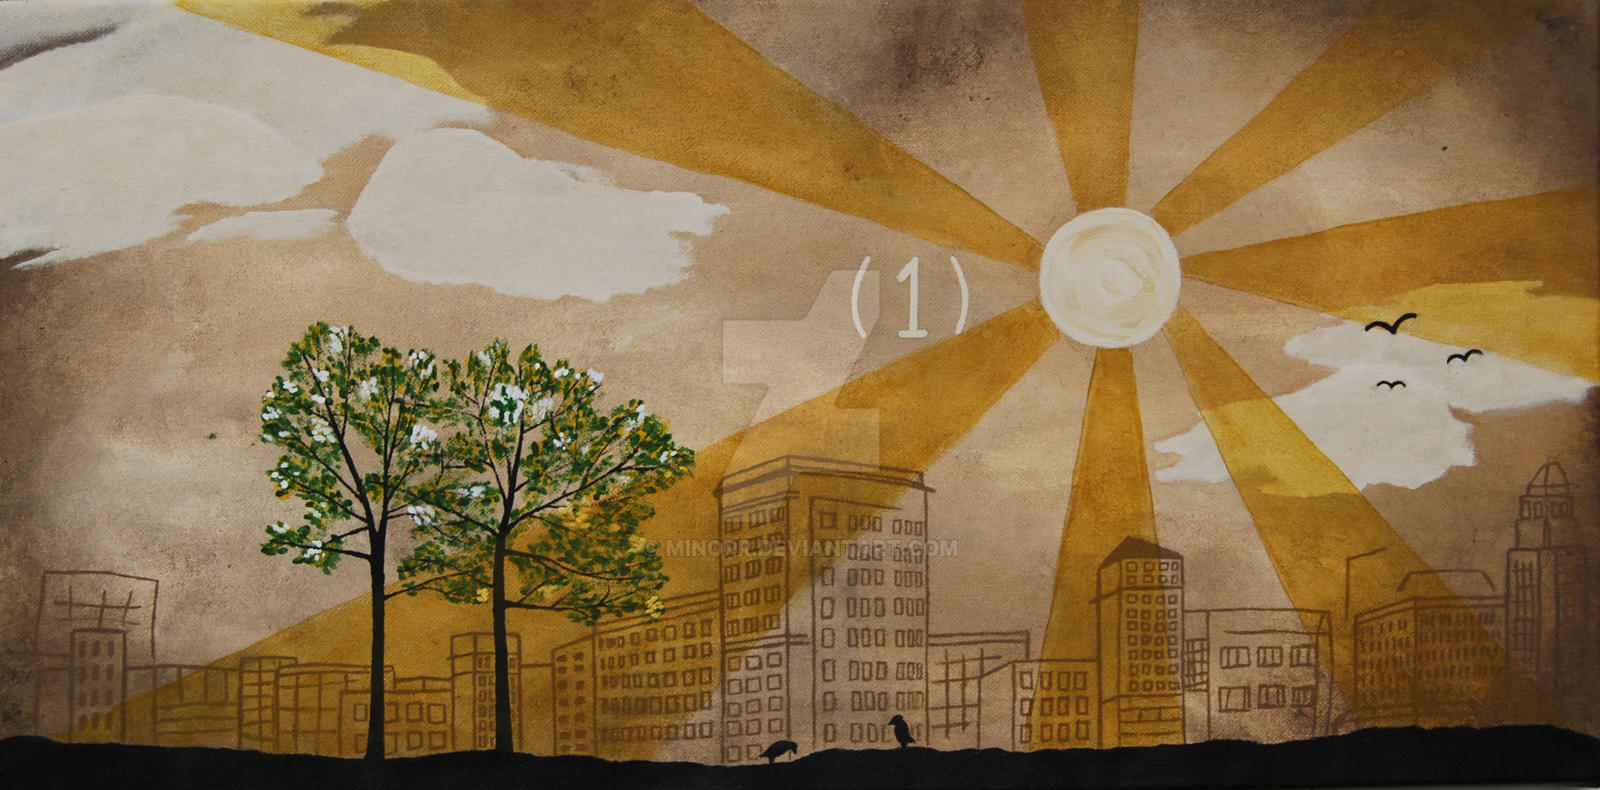 500 days of summer wallpaper - industri